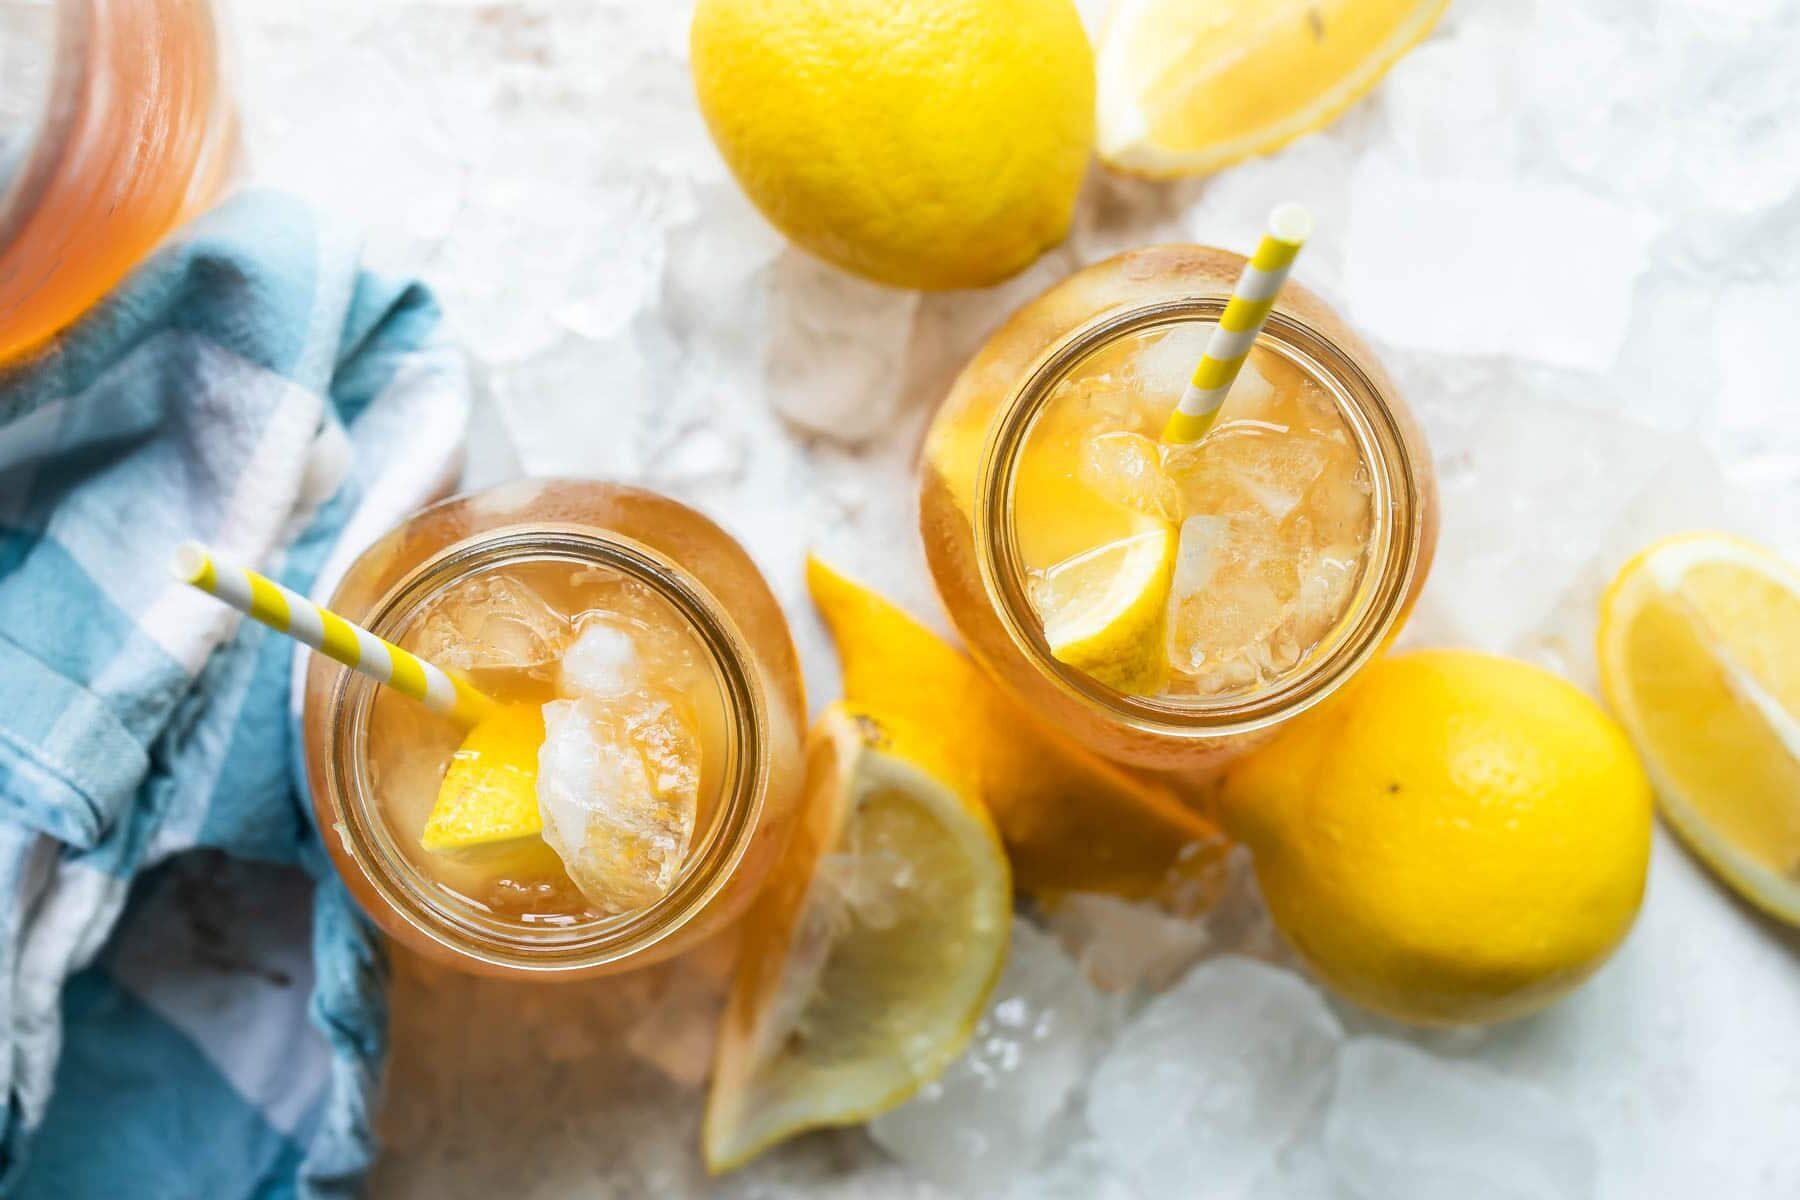 Glasses of arnold palmer (iced tea and lemonade).